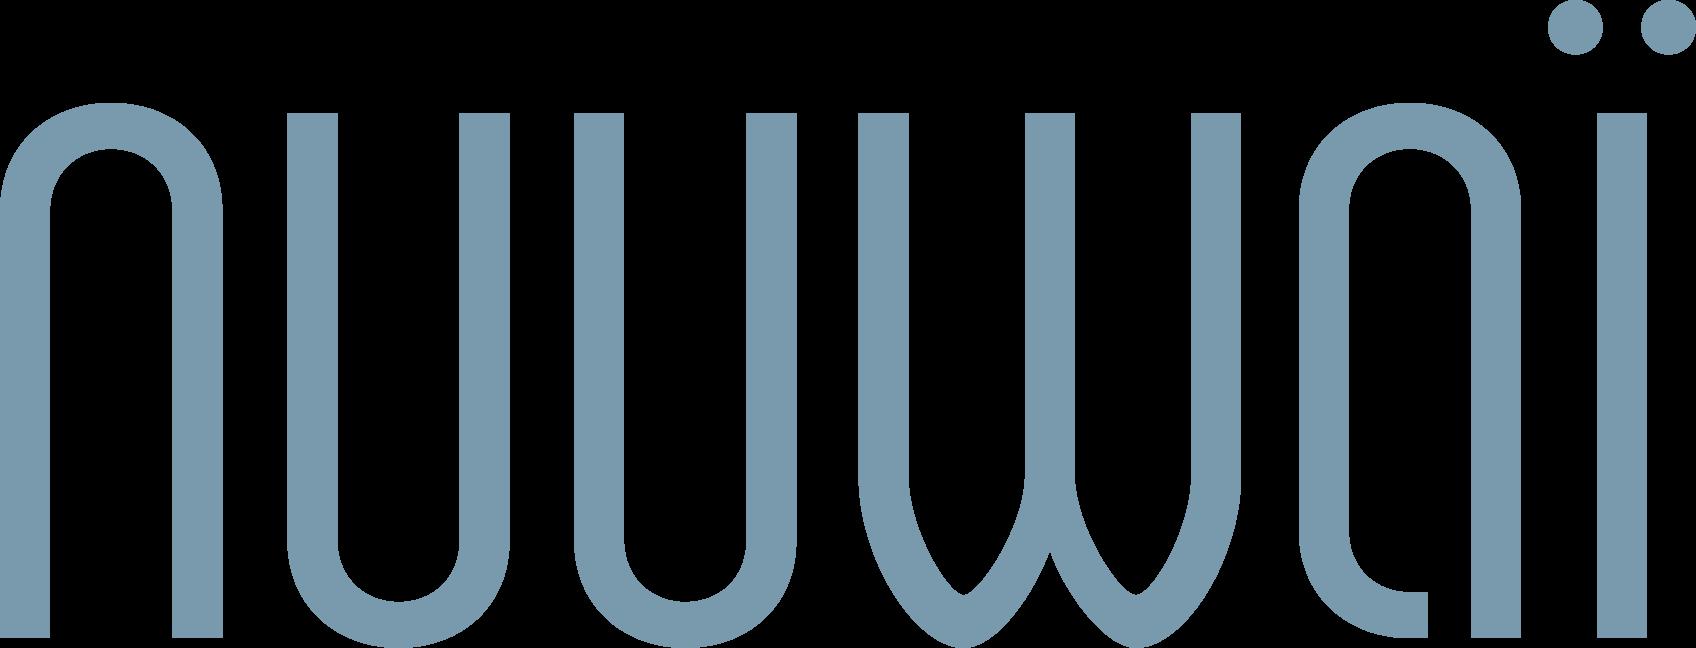 nuuwaï